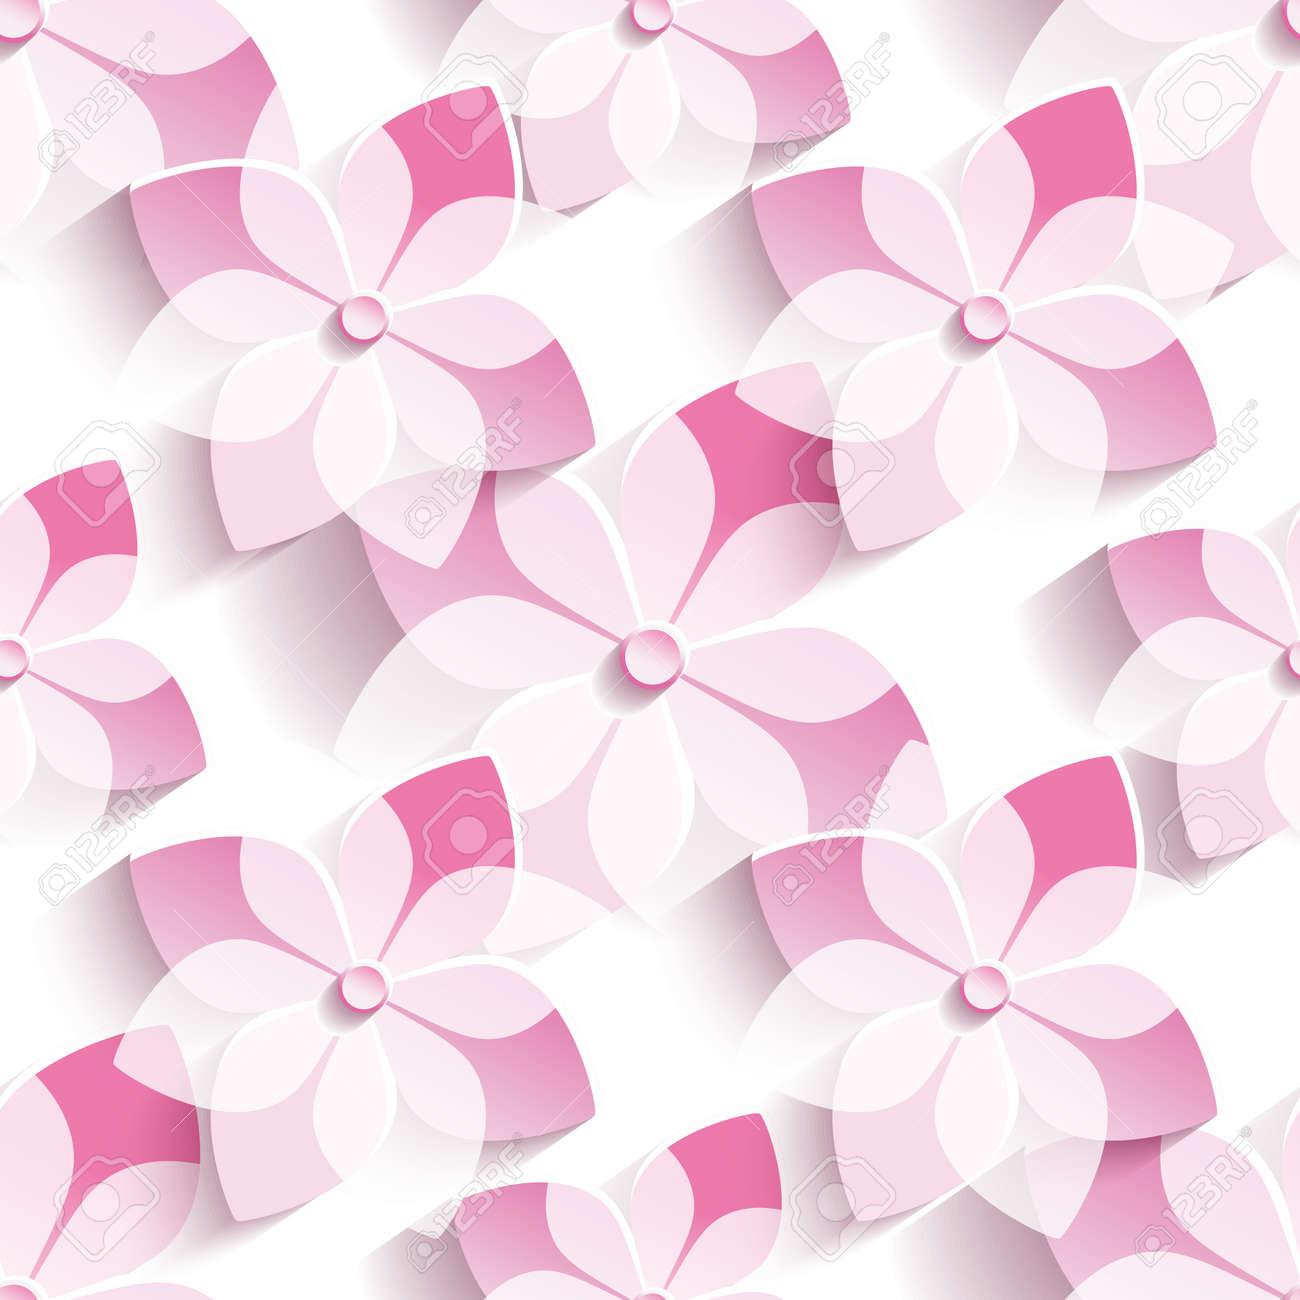 Beautiful Stylish Modern Seamless Pattern With 3d Pink Sakura Blossom,  Japanese Cherry Tree. Floral